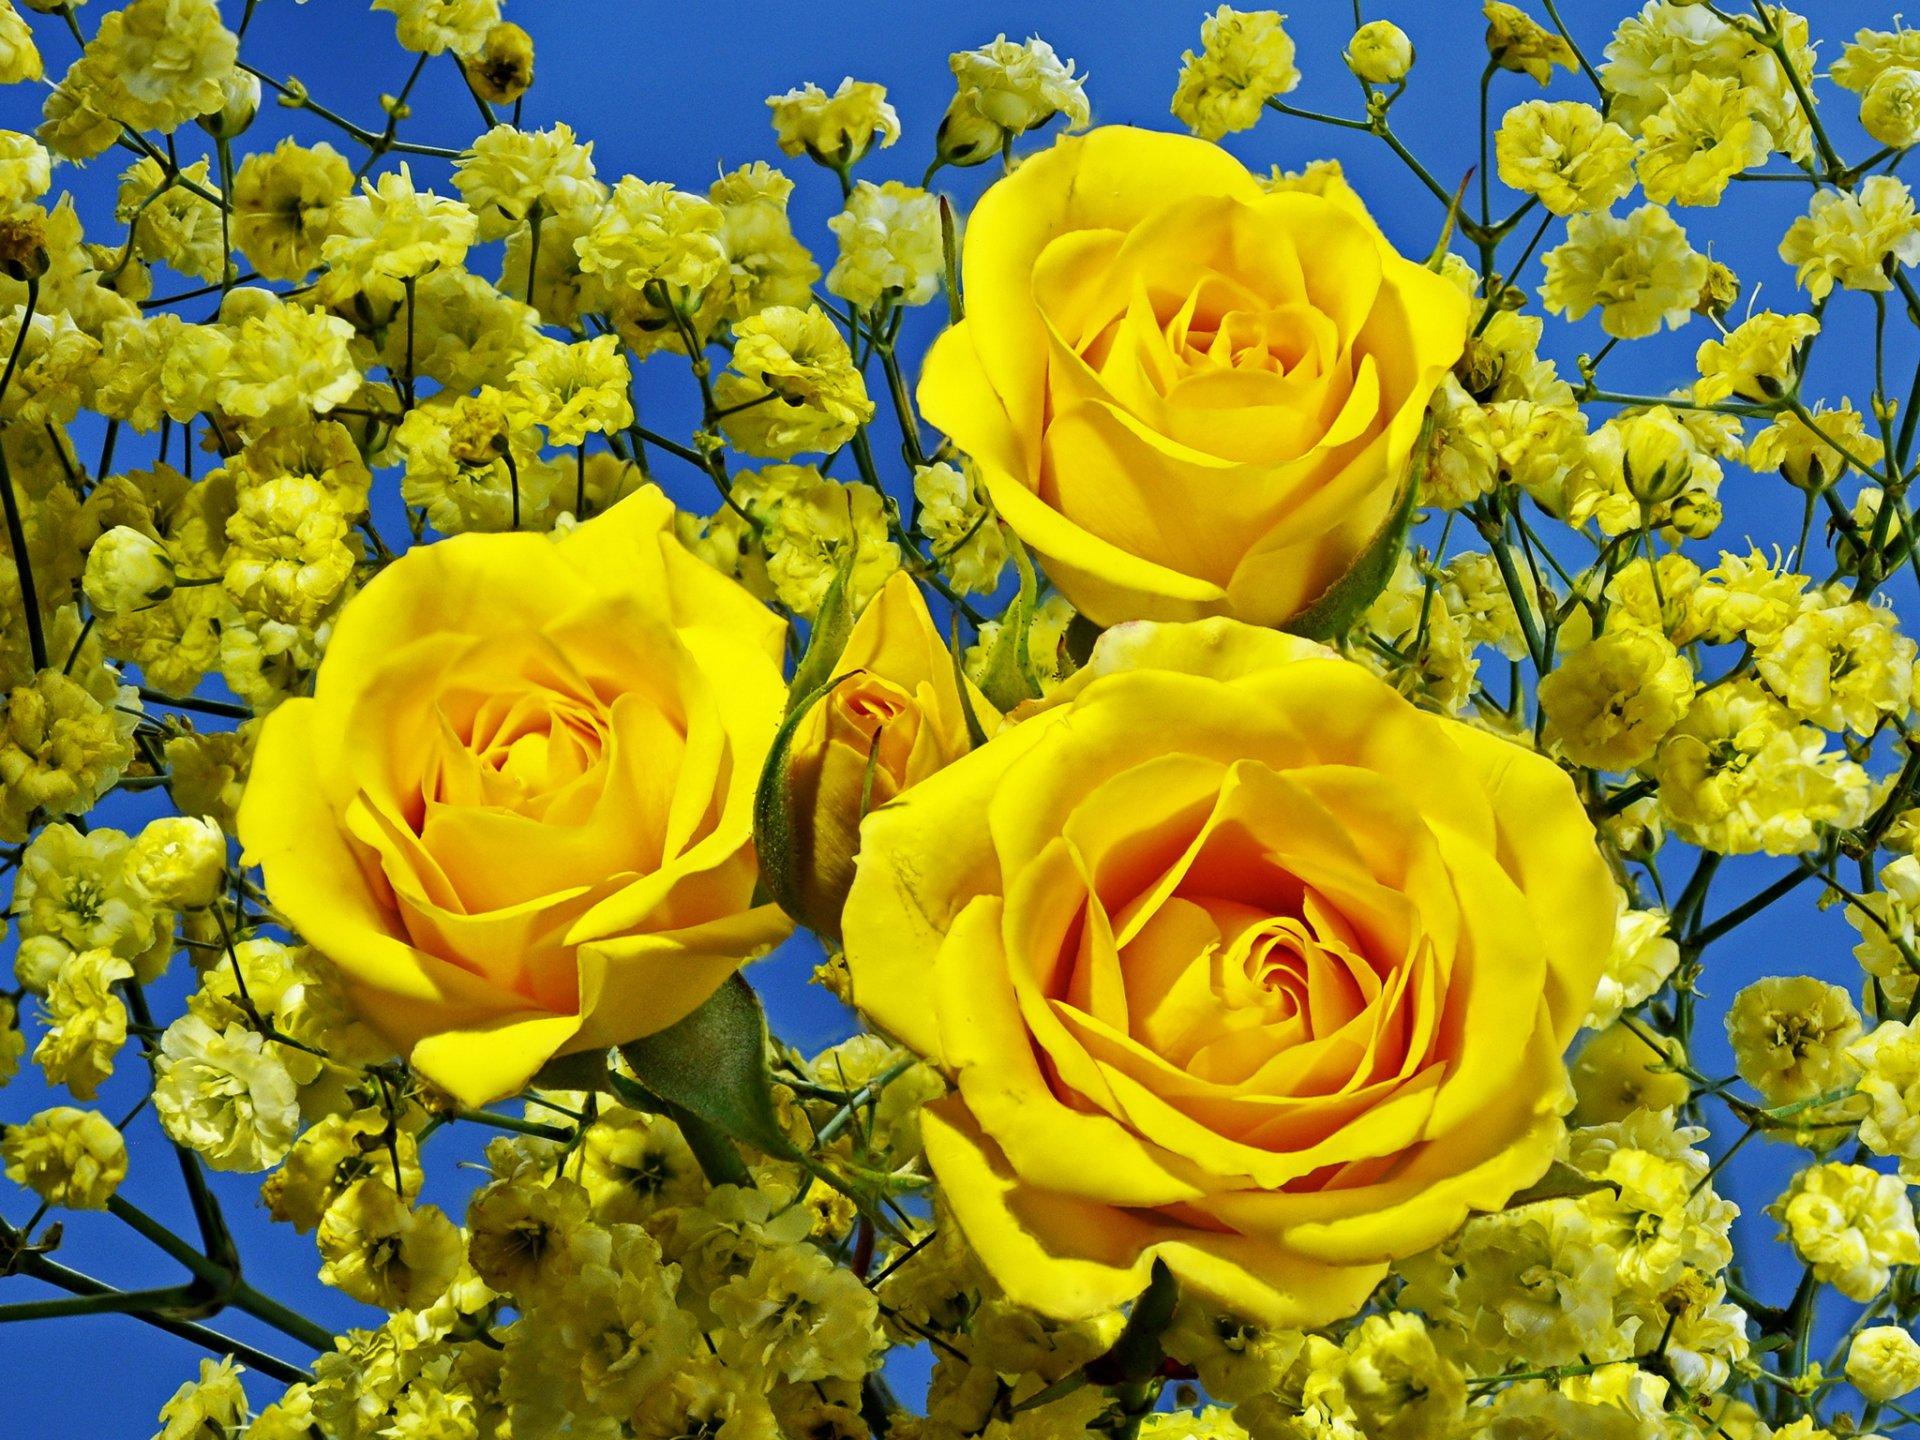 картинки с желтыми цветами морскую пехоту